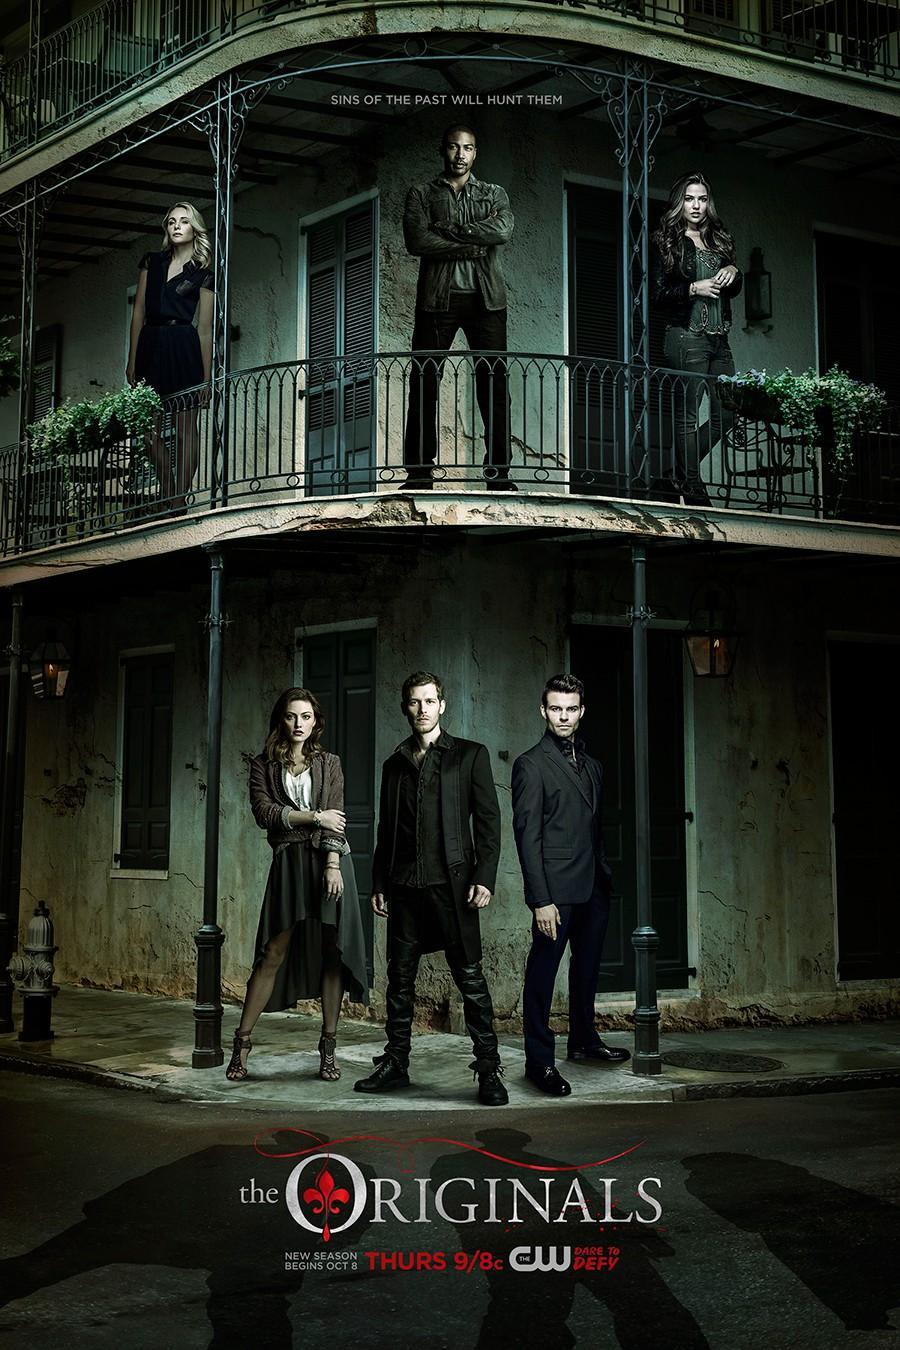 The%20Originals.2 1 دانلود سریال The Originals : قسمت ۵ از فصل ۵ اضافه شد